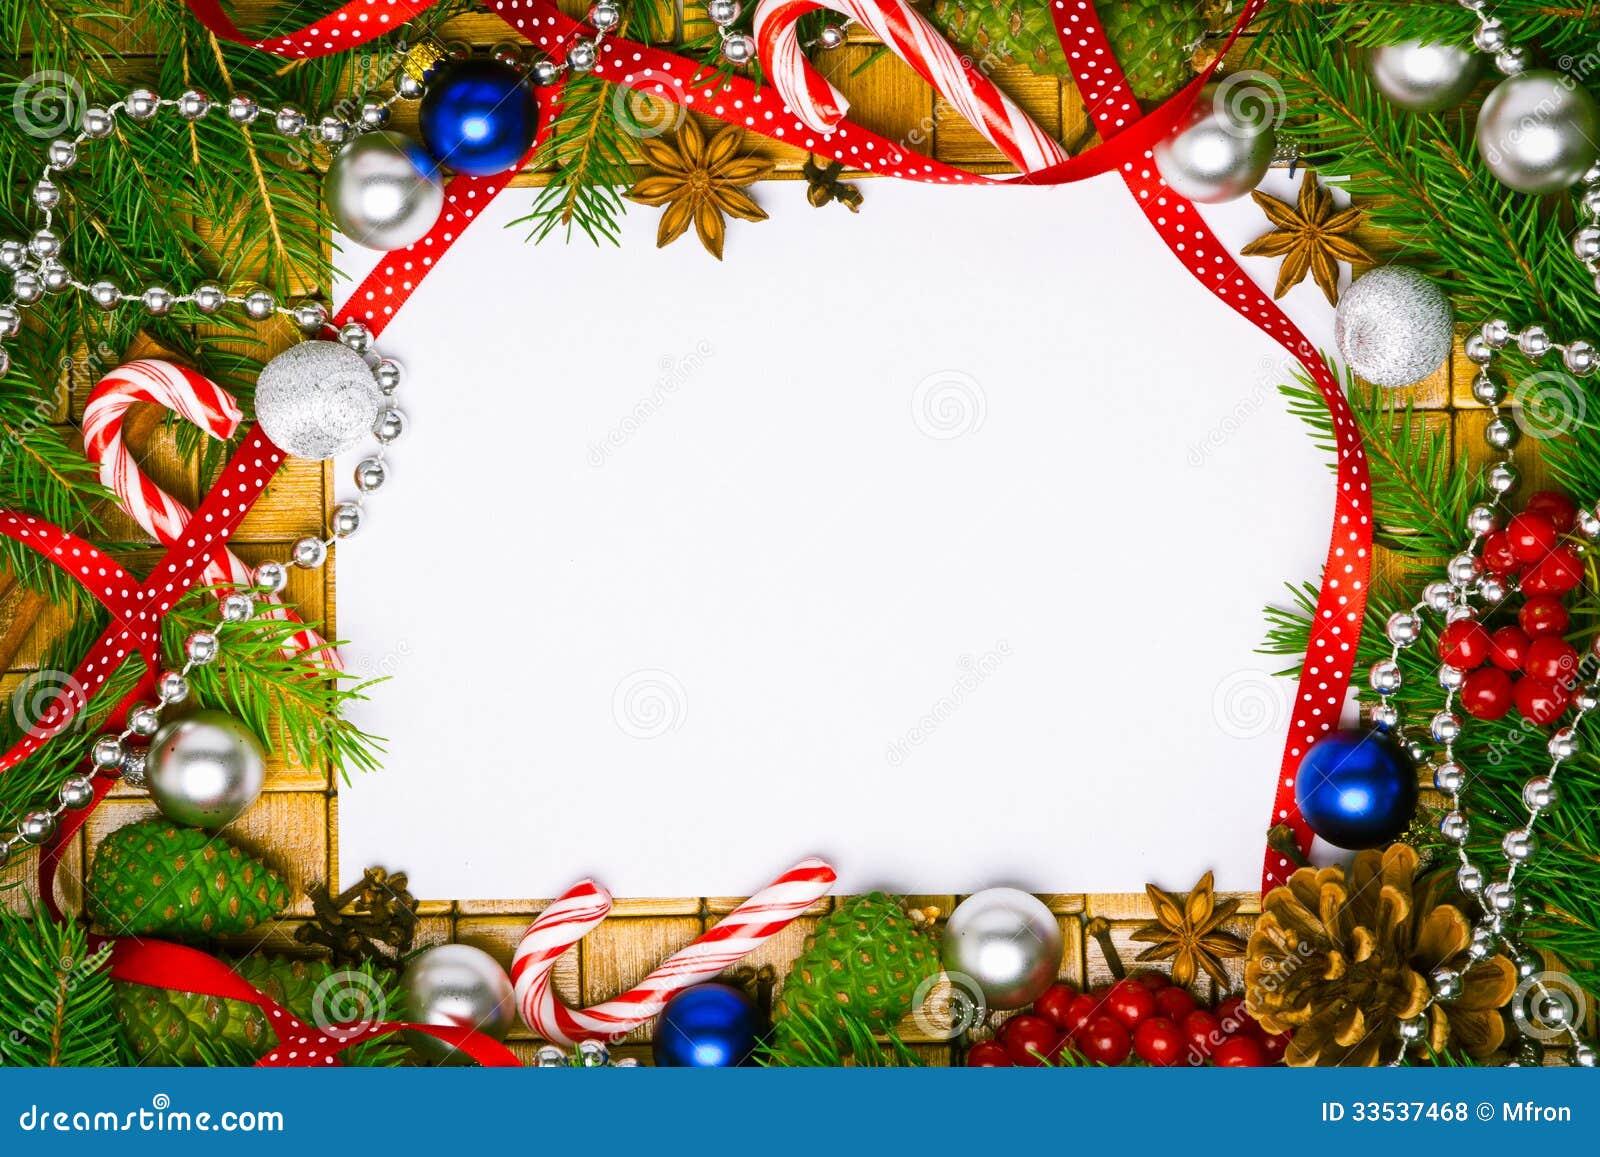 Christmas Greetings Images.Blank Card For Christmas Greetings Stock Photo Image Of